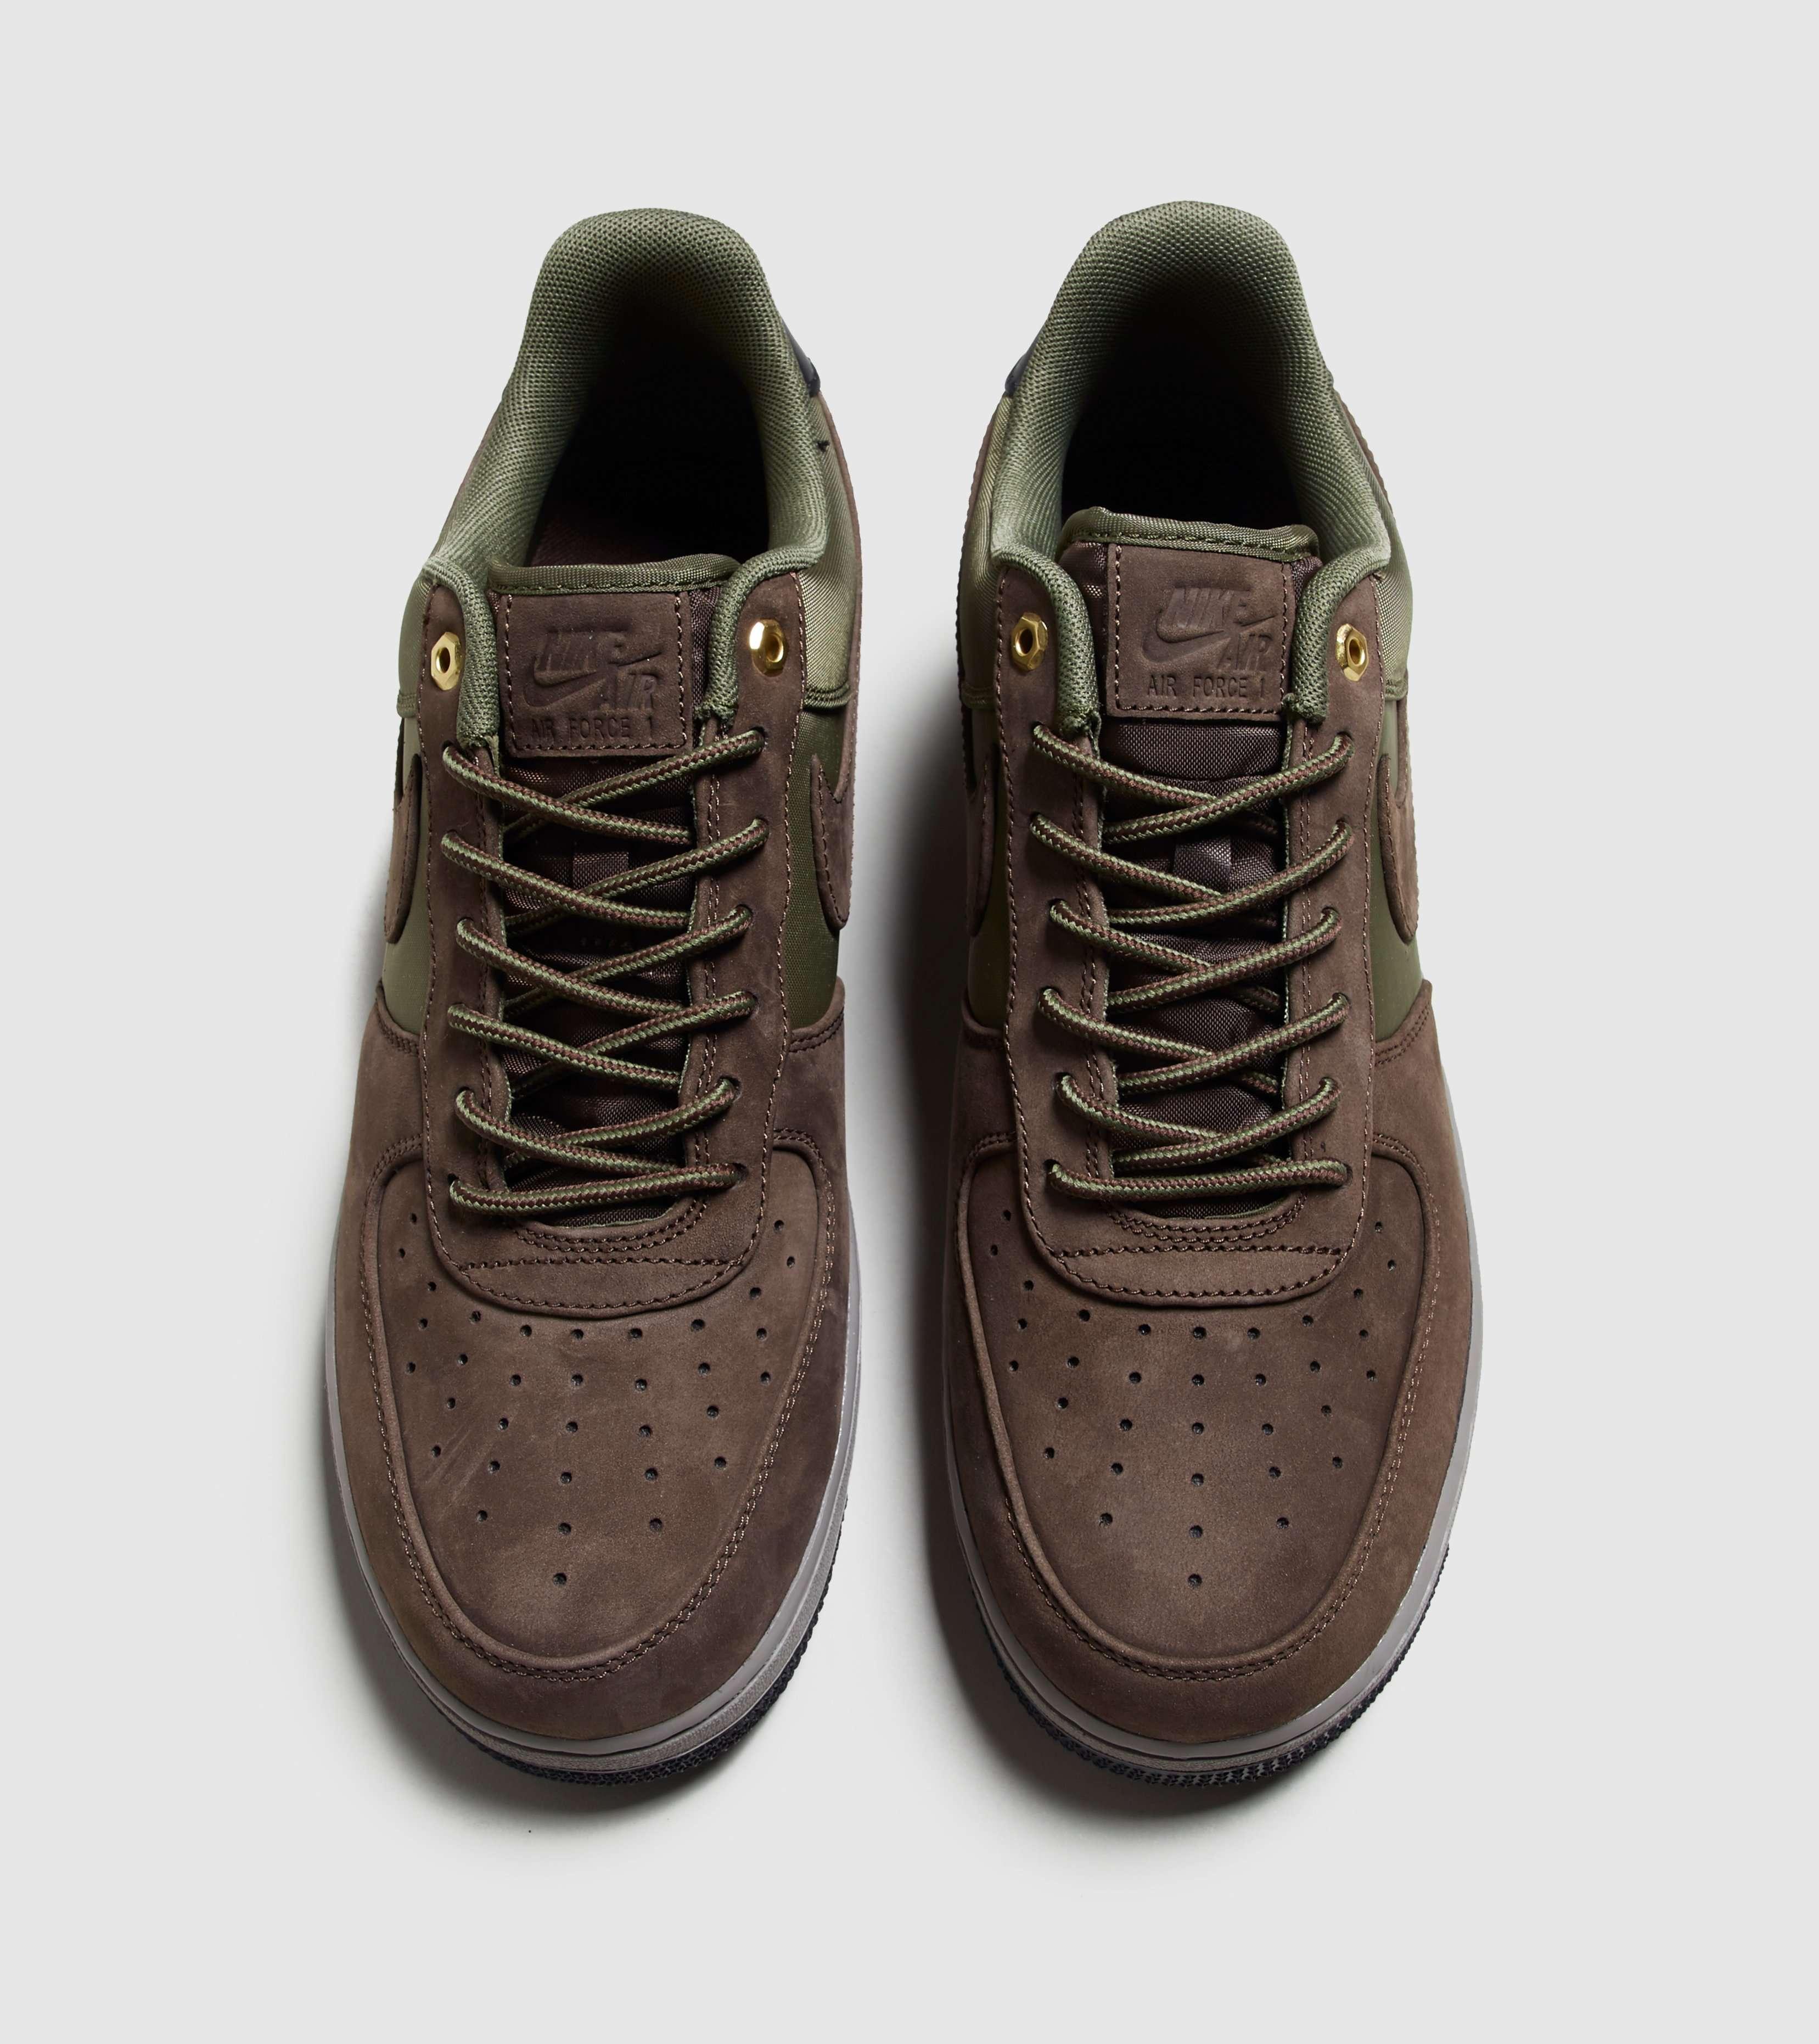 Nike Air Force 1 '07 Premier Low